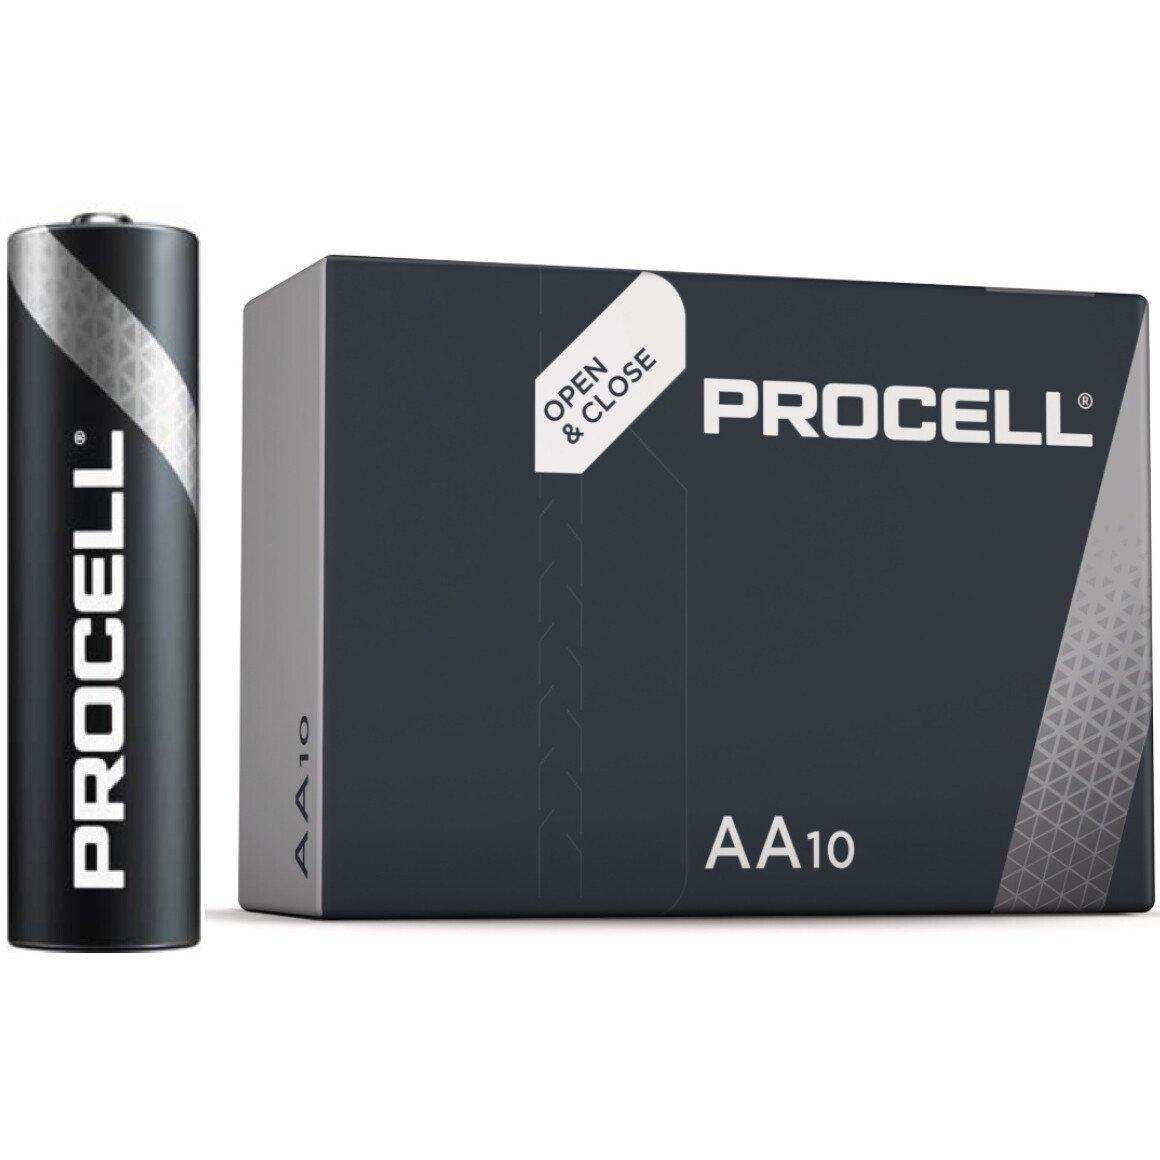 Duracell ID1500 AA LR6 Procell Alkaline Batteries Box of 10